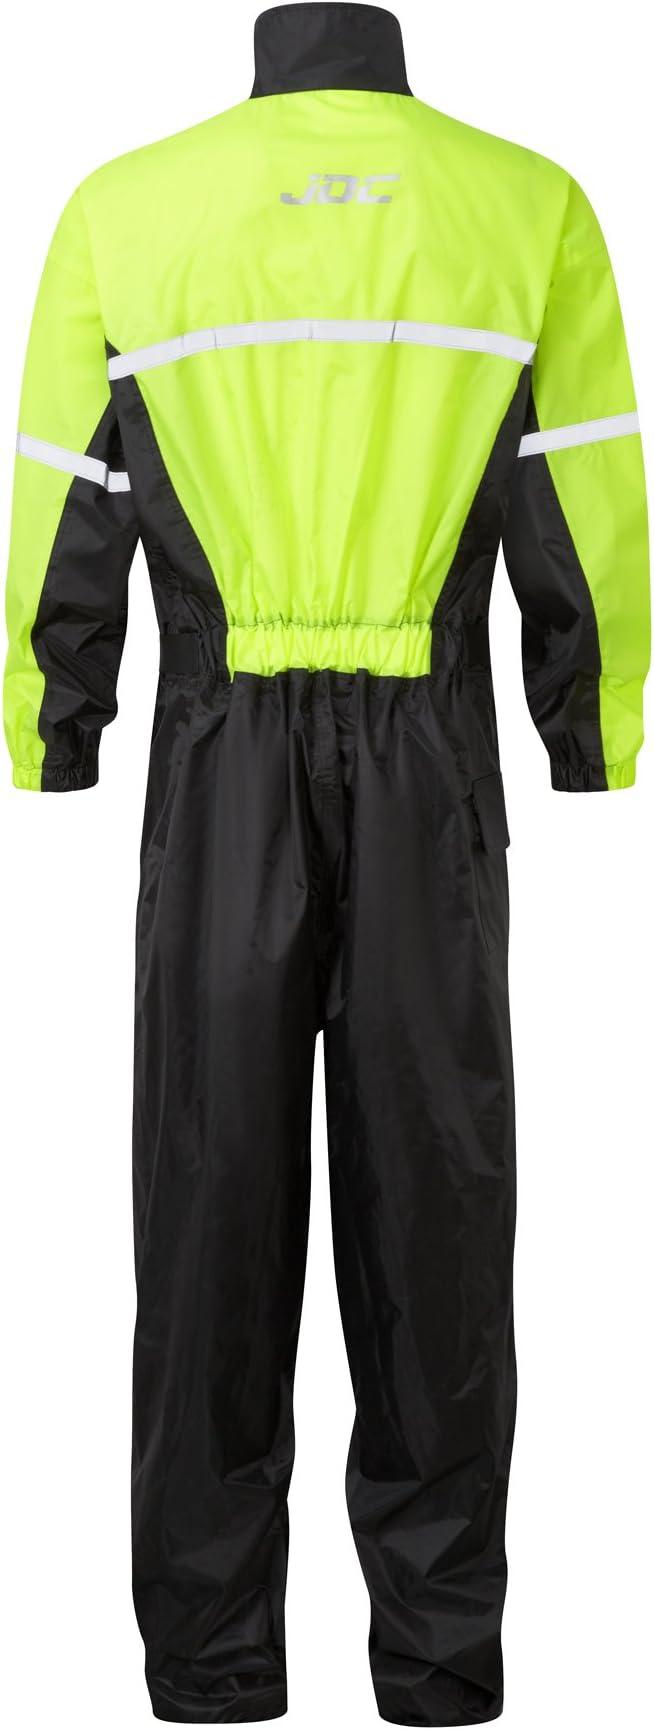 L 32L Regenkombi Wasserdichter Regenschutz JDC Motorrad Kombi SHIELD 1-St/ück Schwarz